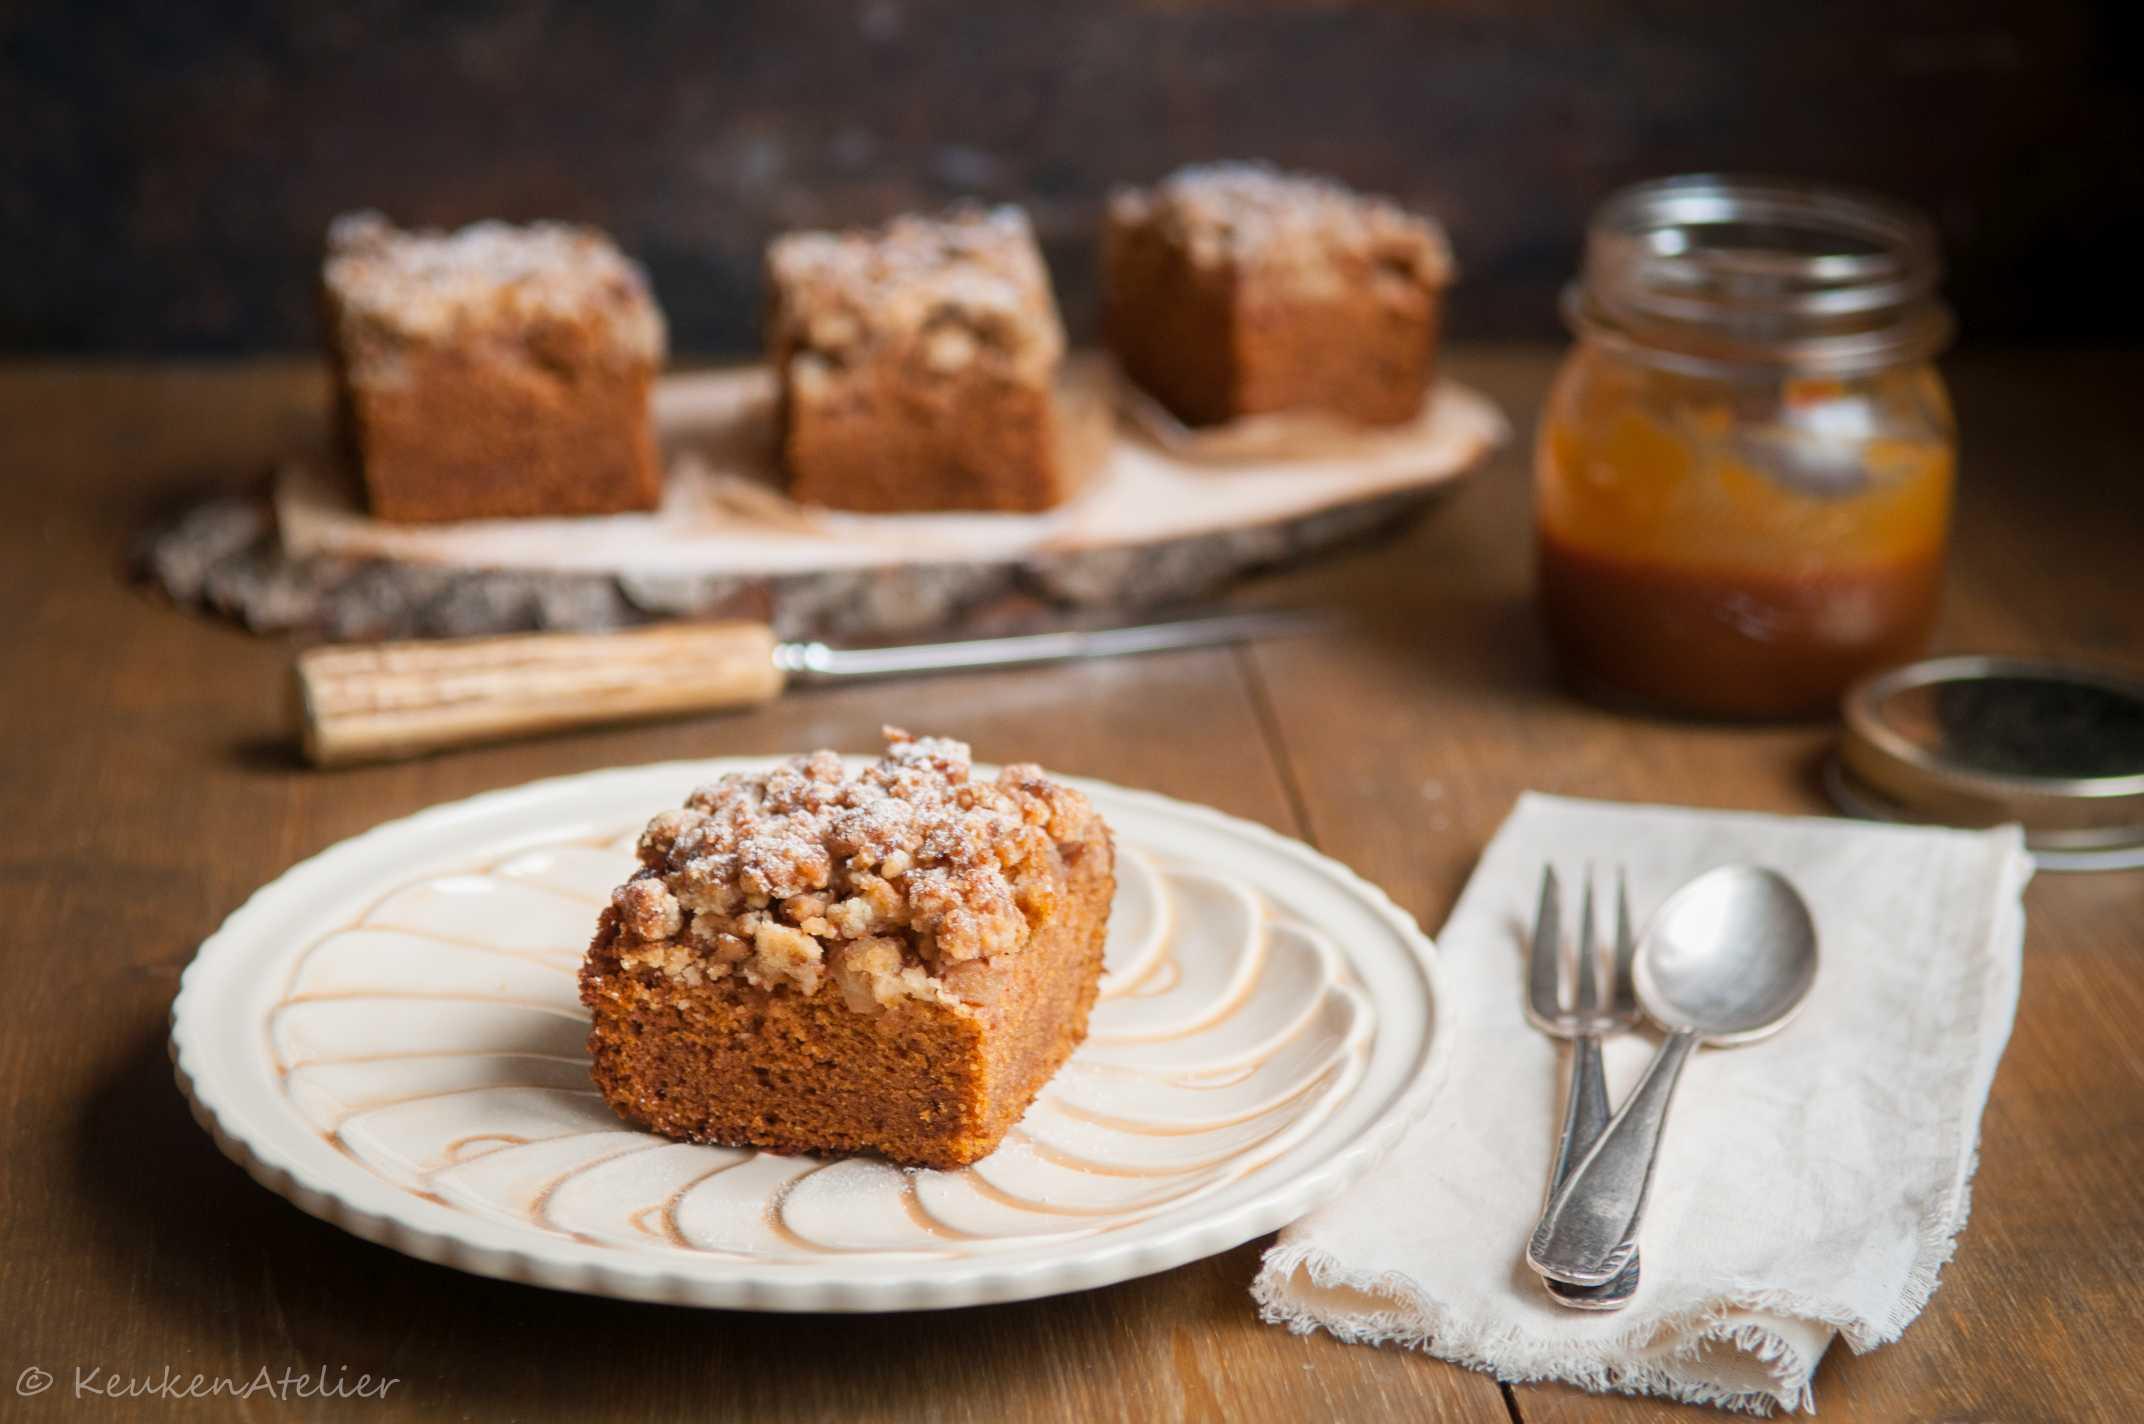 pompoencake met appel en pecankruimel 1e | KeukenAtelier